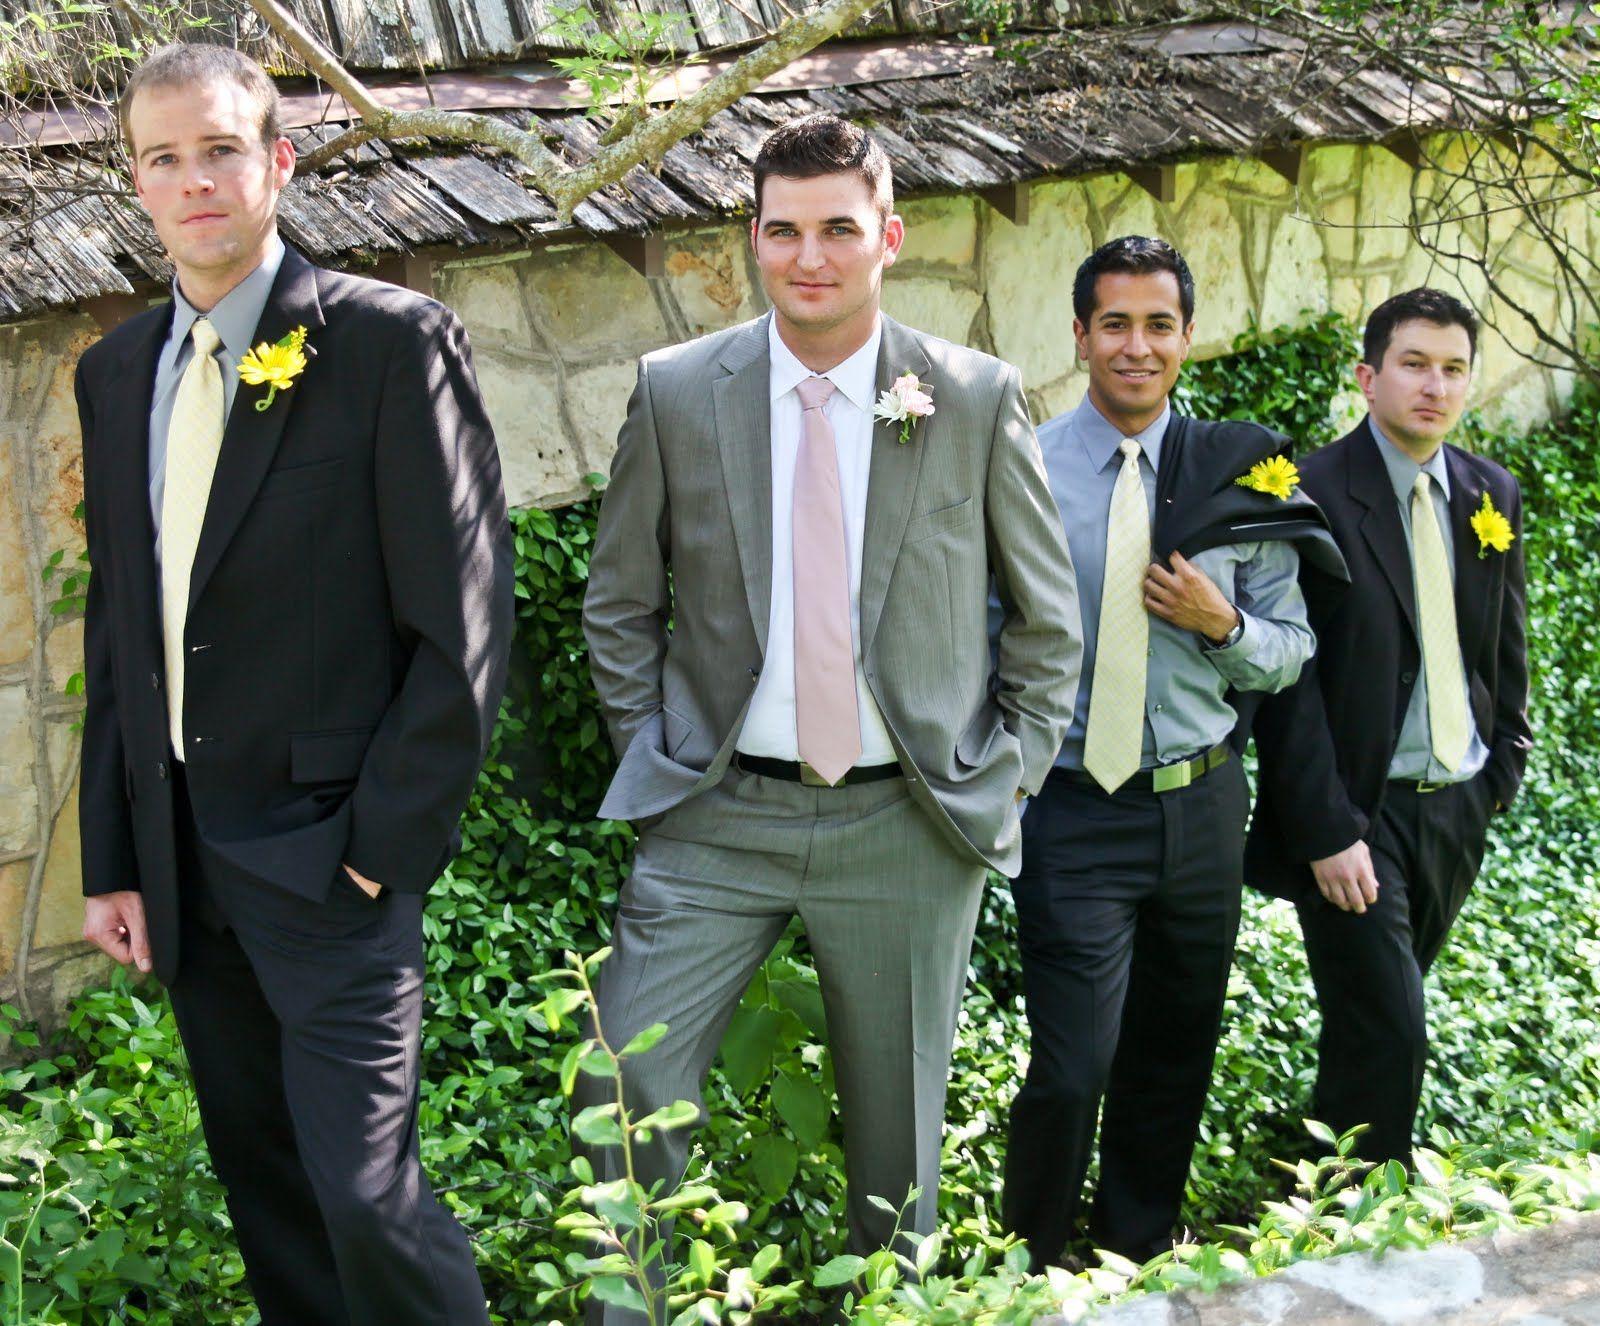 Wedded Bliss Wedding, Wedding groomsmen, Wedding inspiration